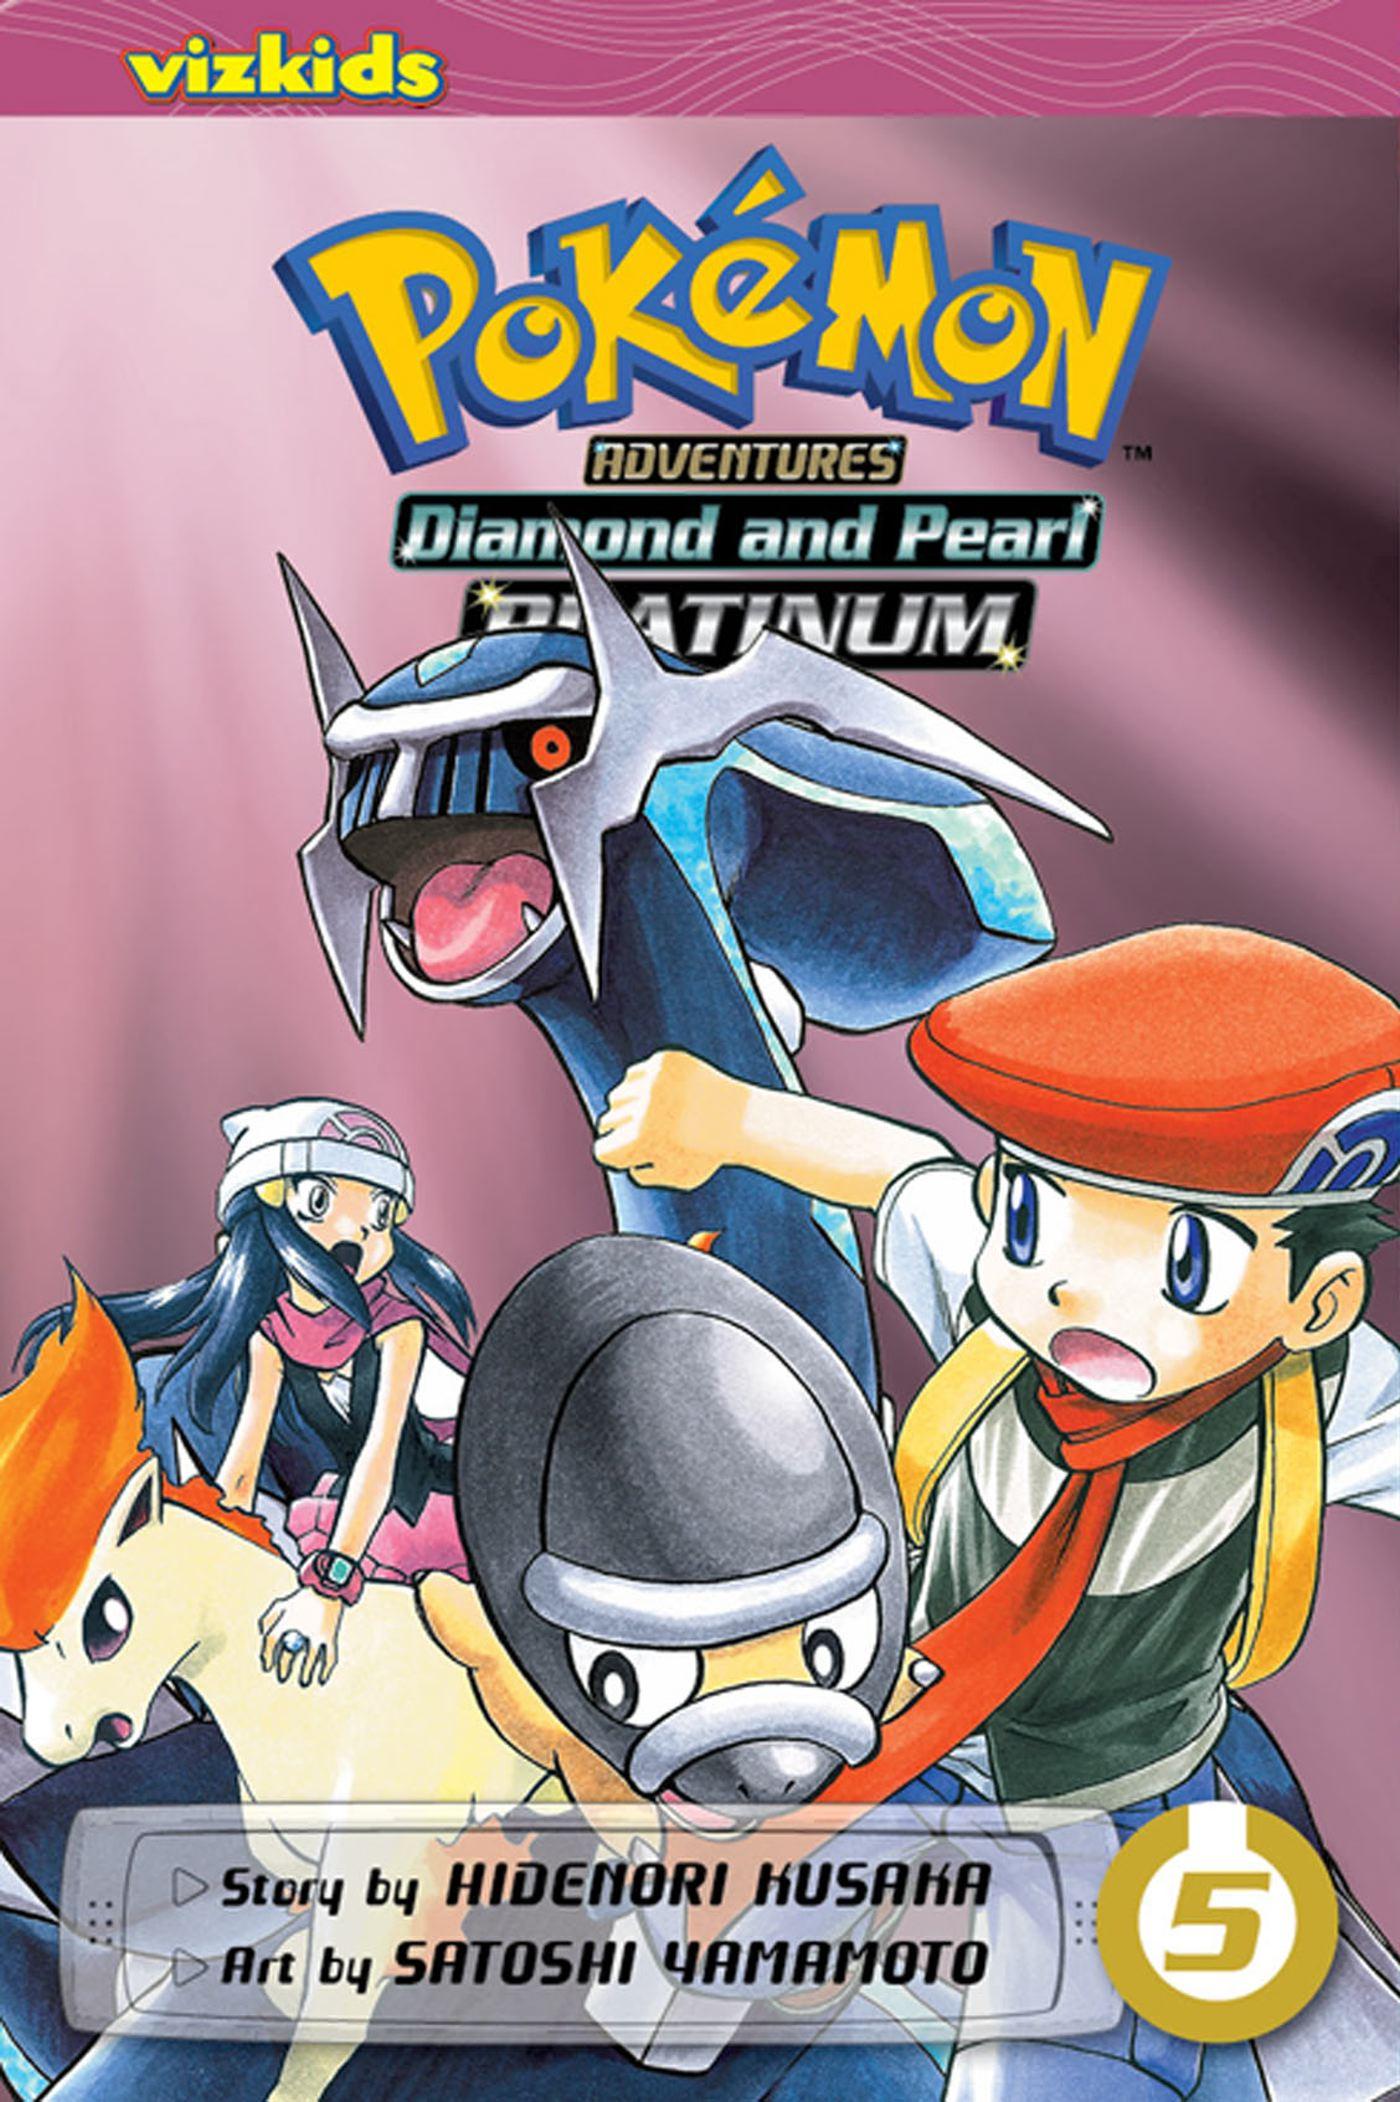 Pokémon Adventures: Diamond and Pearl/Platinum, Vol. 5 ...